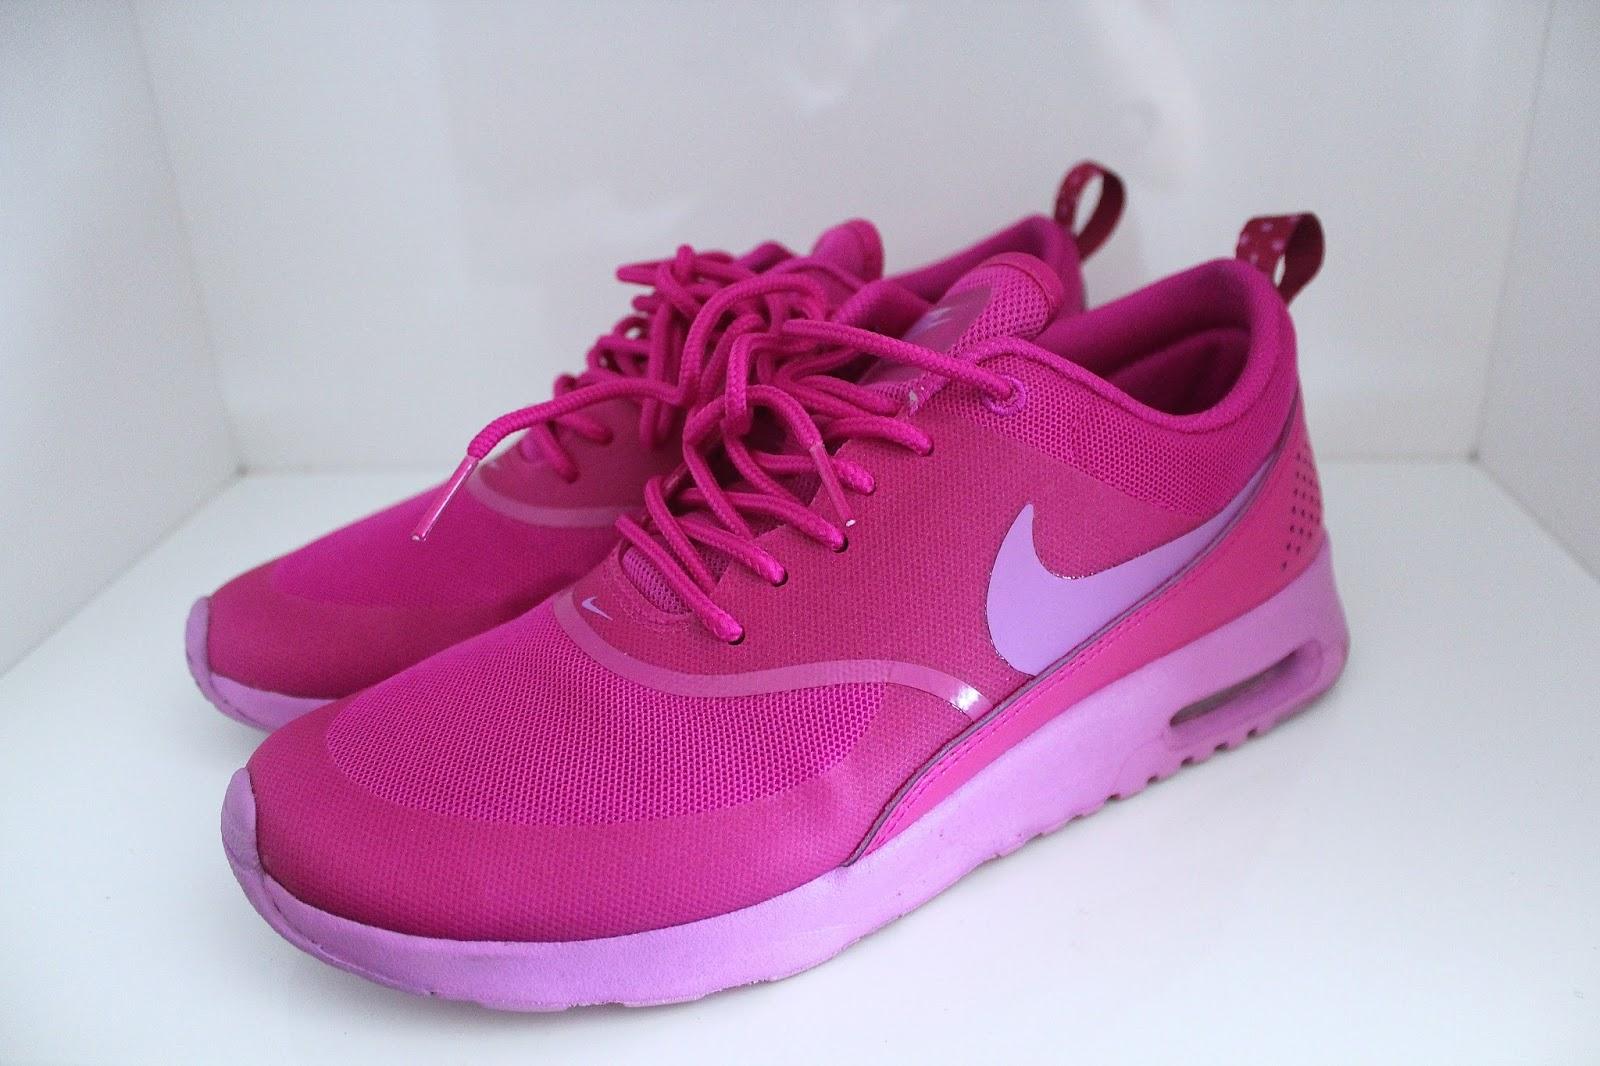 Nike Air Max Thea Fucsia